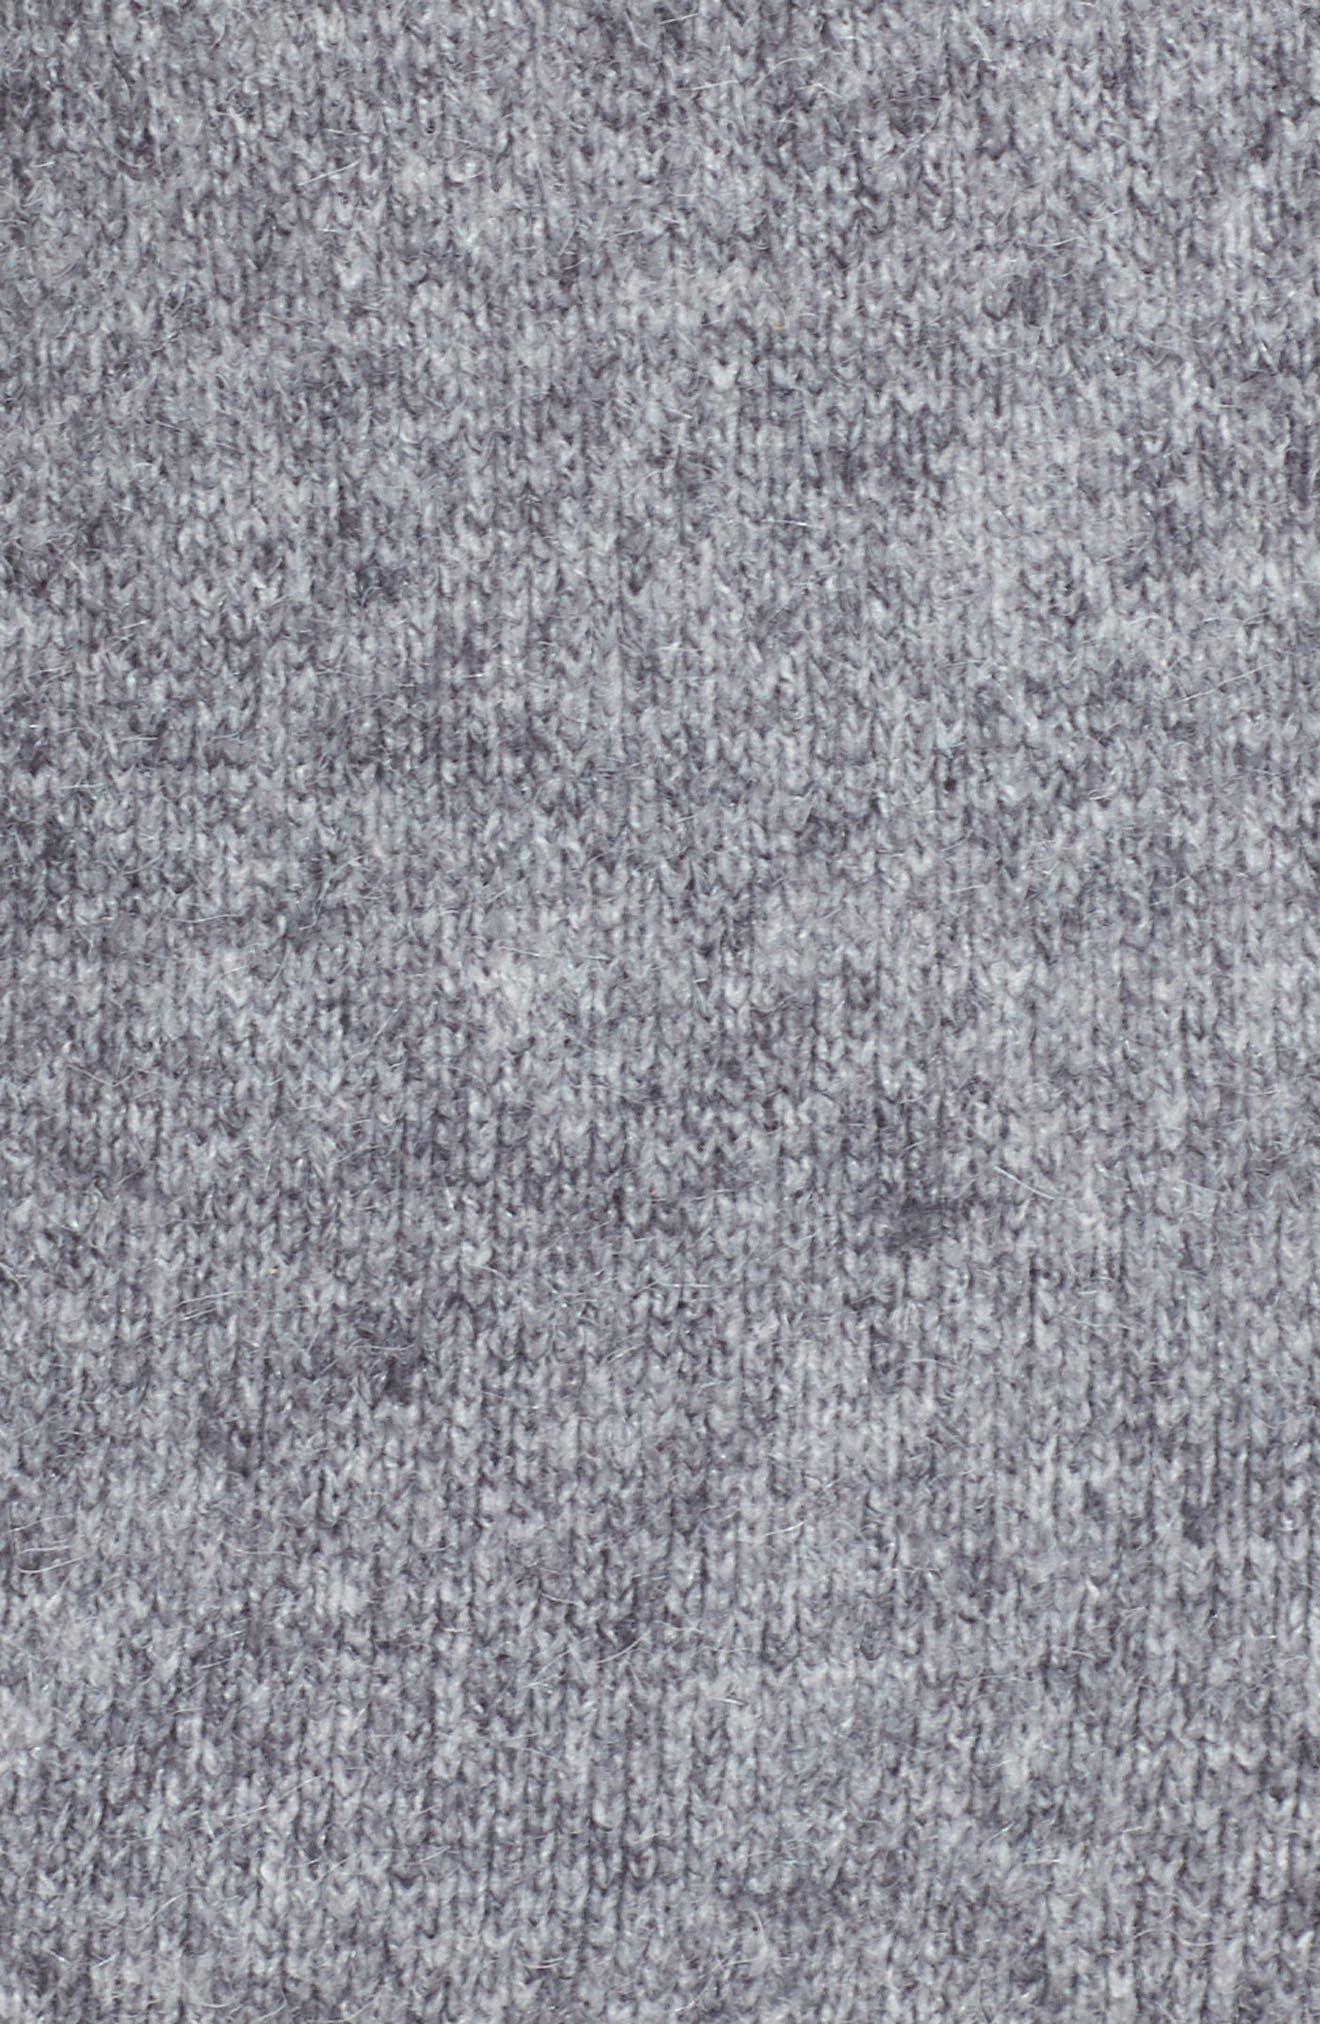 Zanja Embroidered Knit Bomber Jacket,                             Alternate thumbnail 6, color,                             034